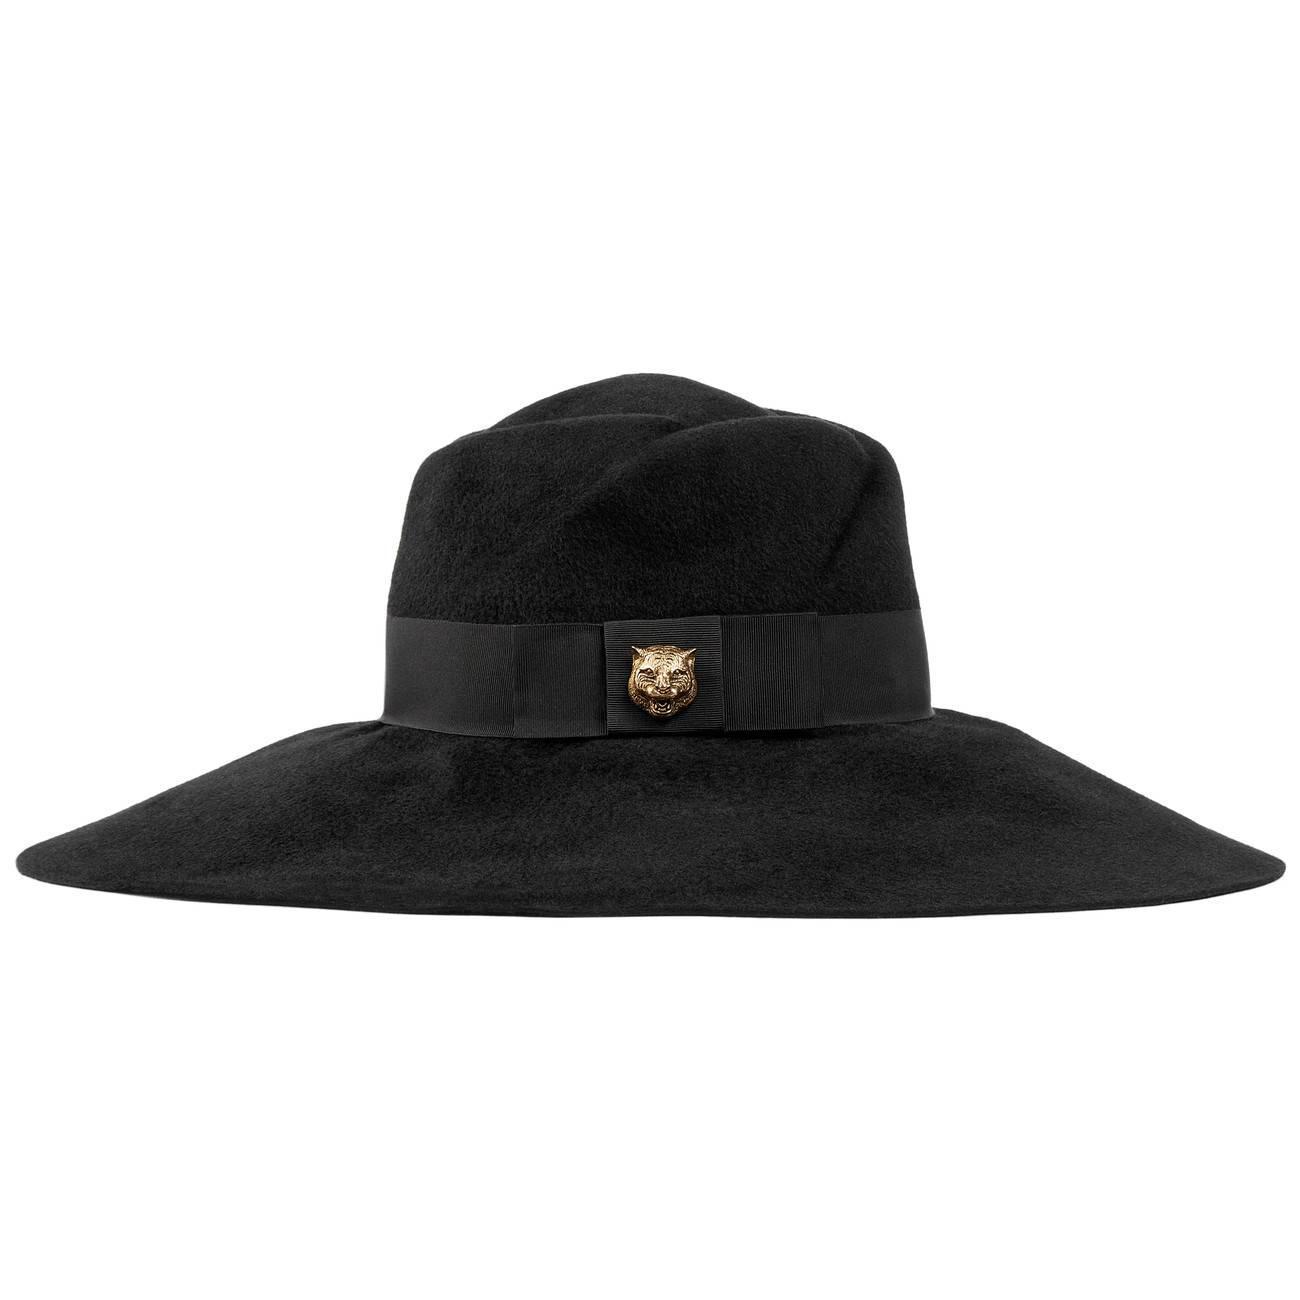 2892fe882812d Lyst - Gucci Felt Wide-brim Hat in Black - Save 9%